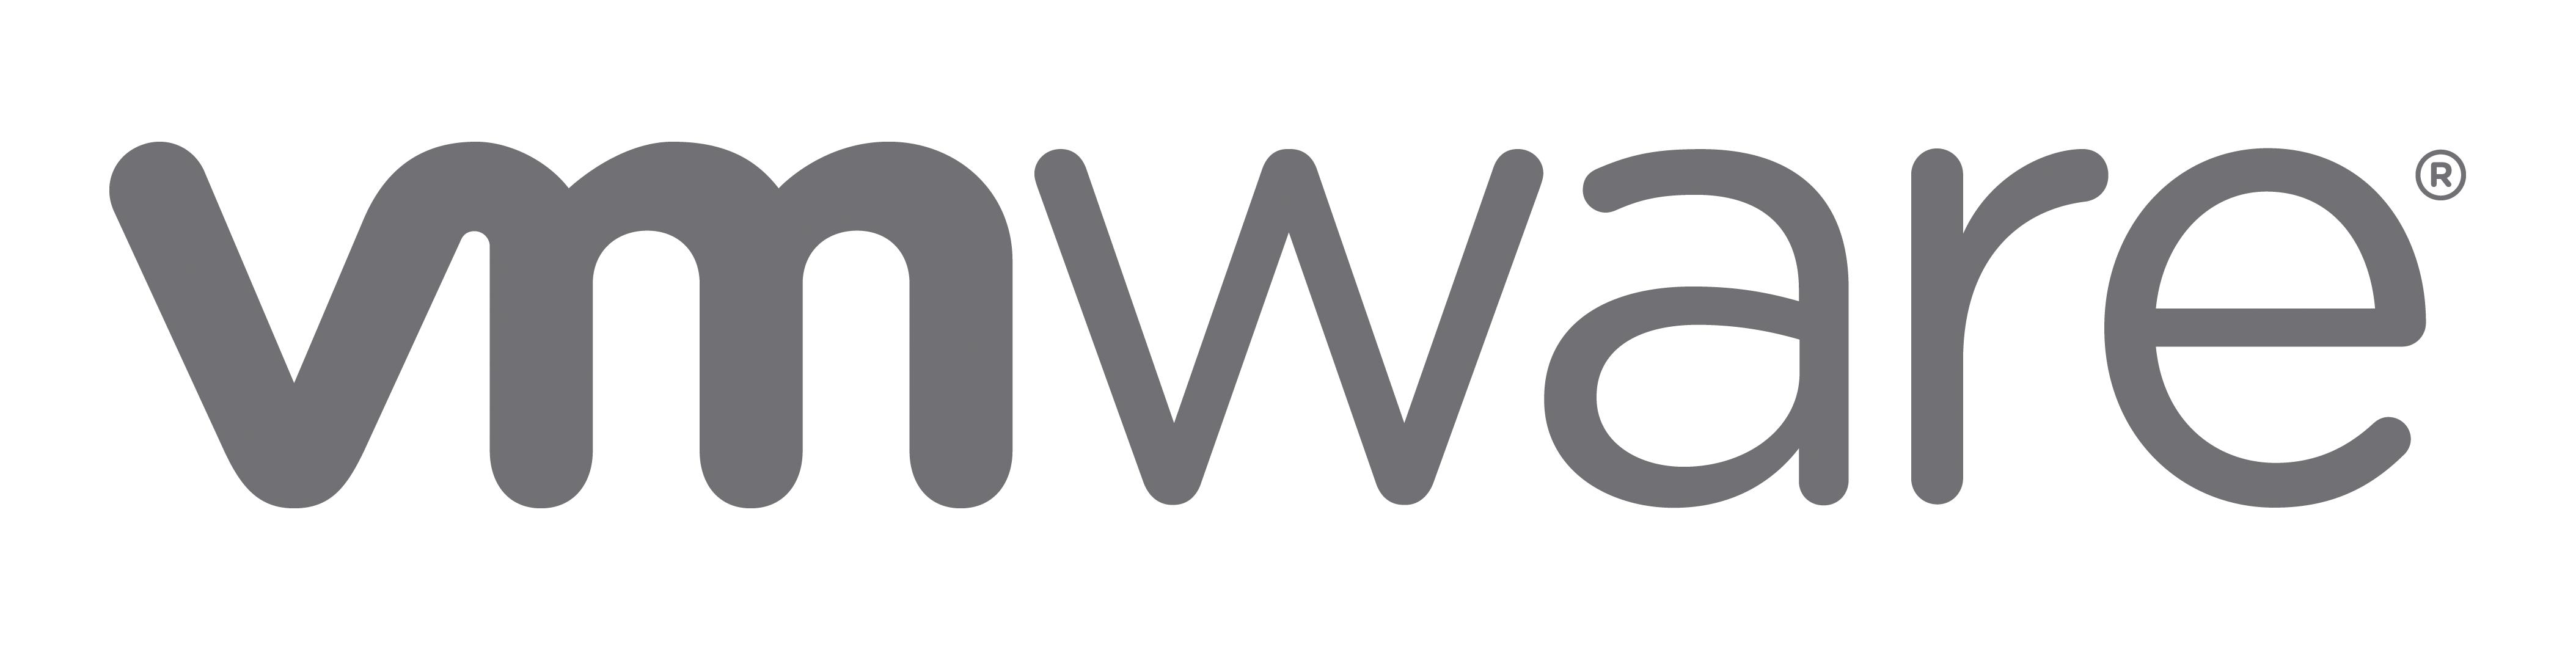 vmware.com | UserLogos...